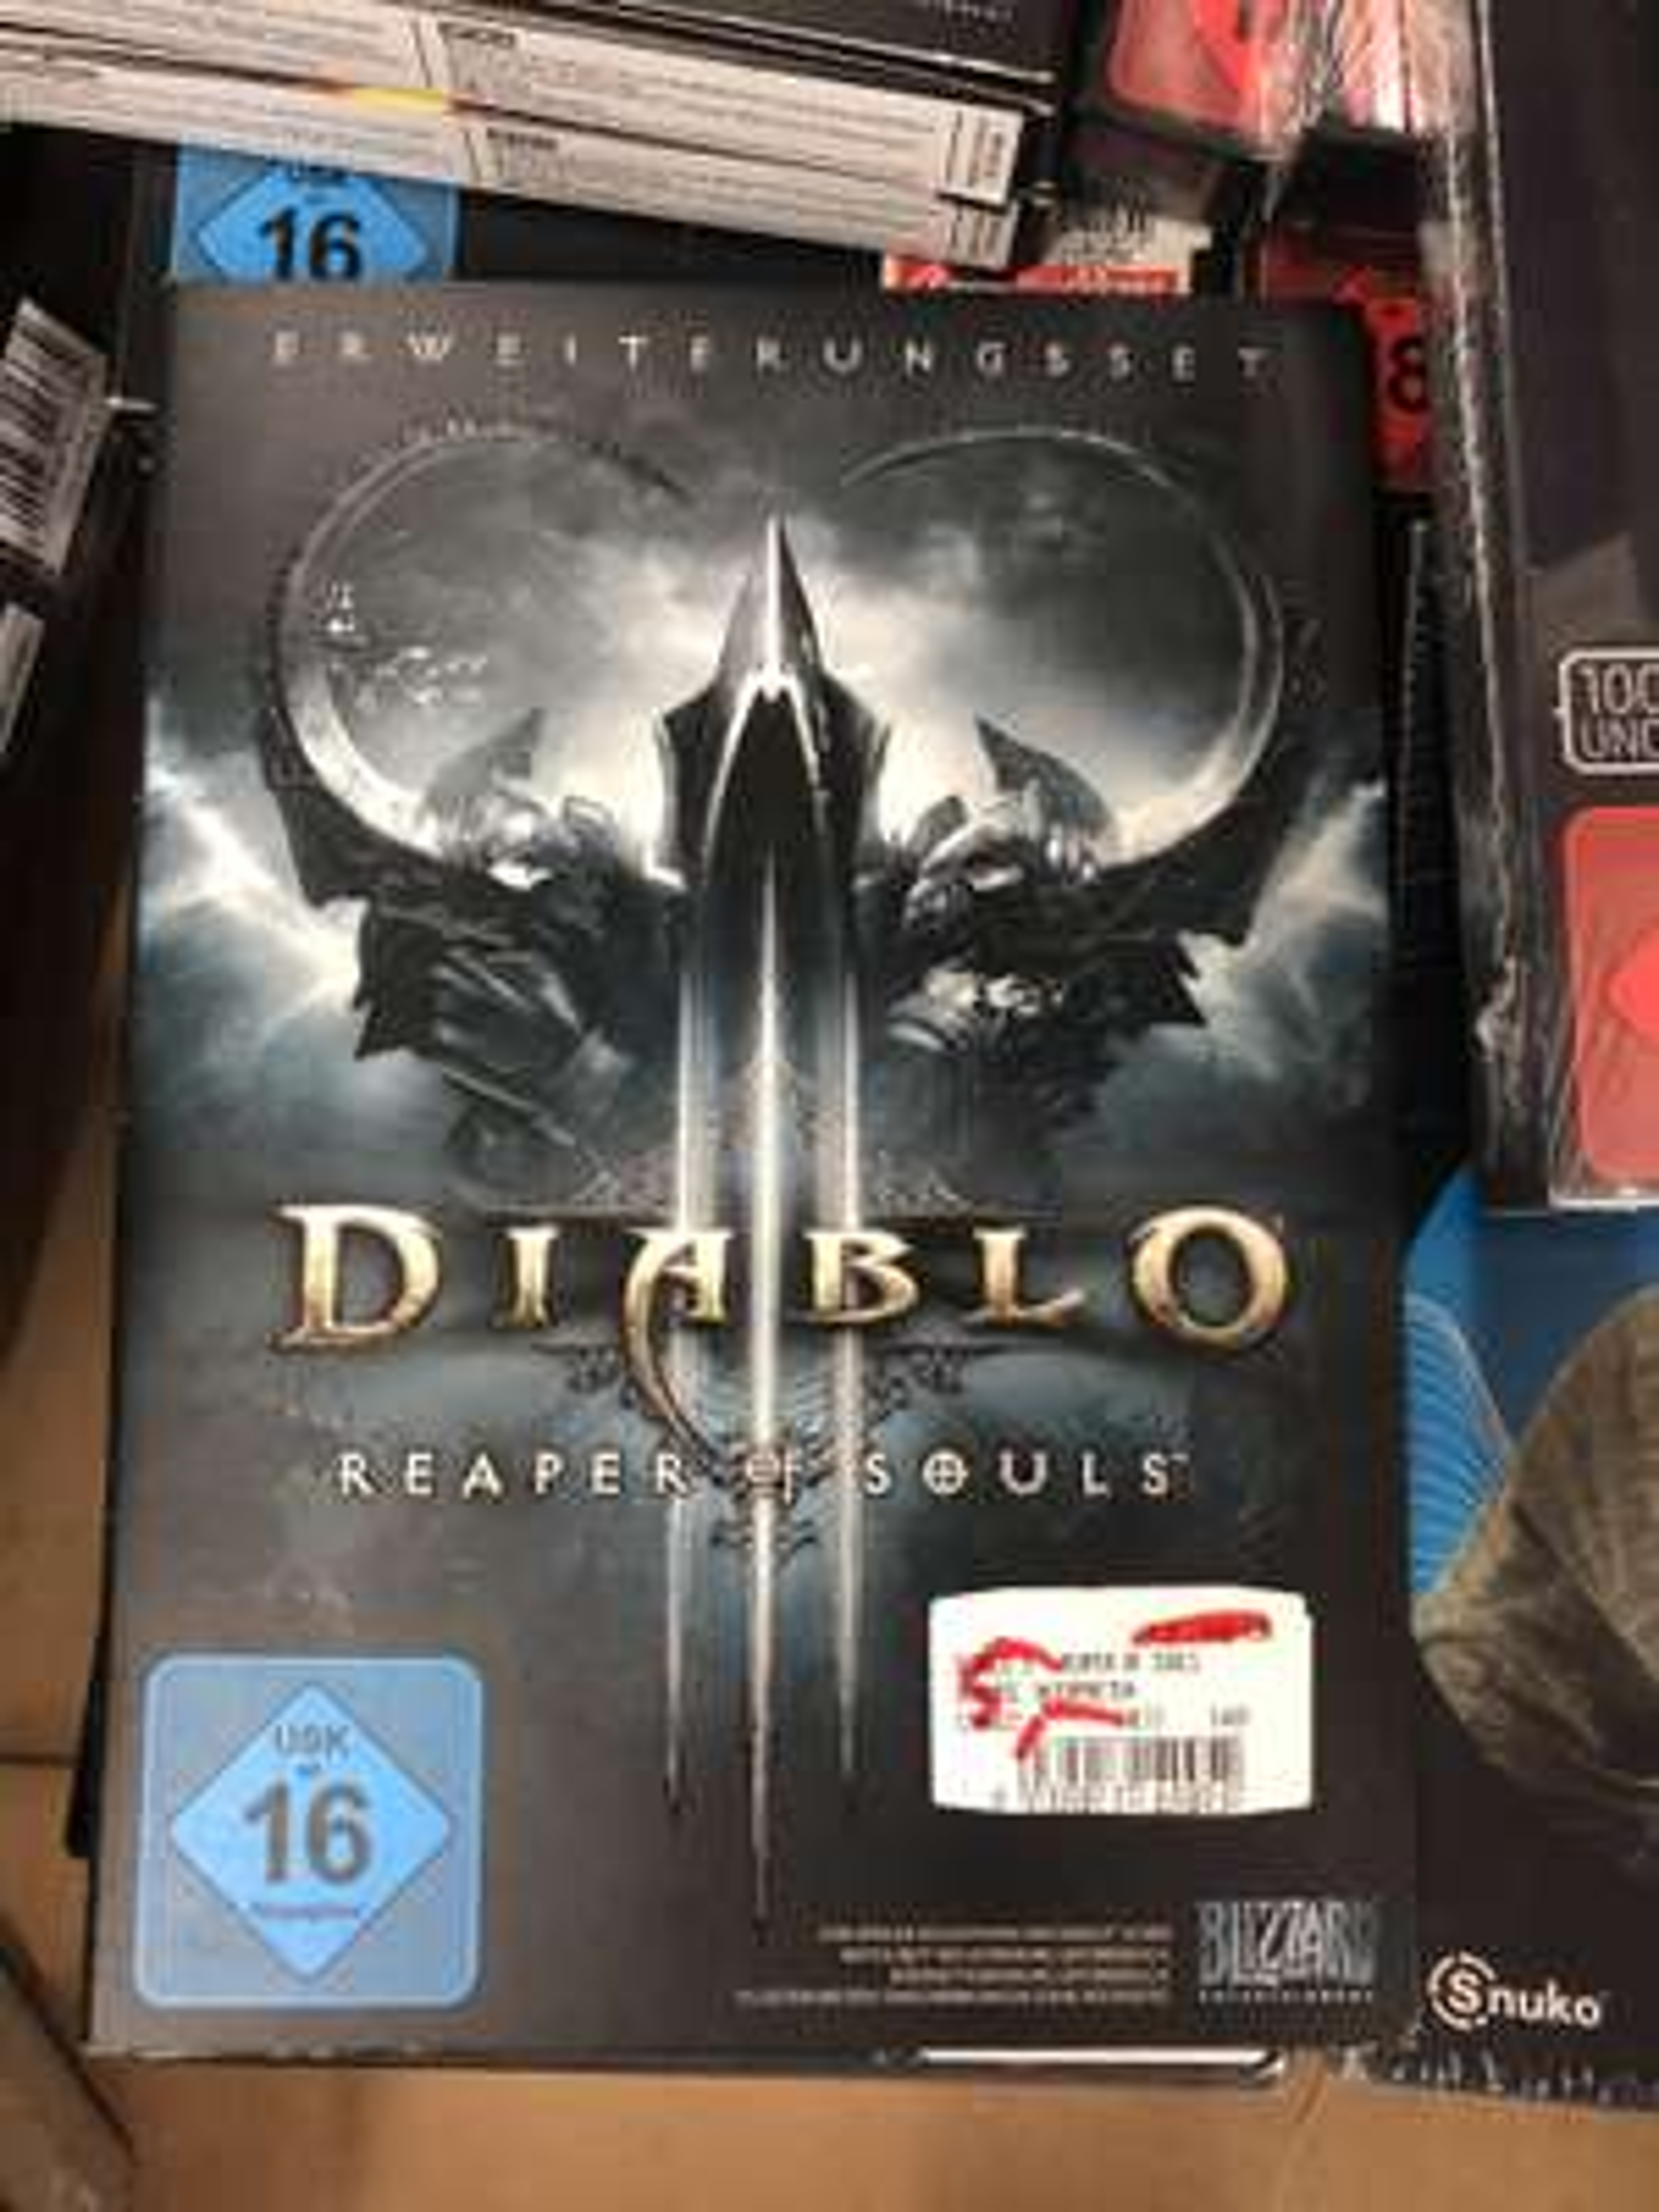 [Lokal] Diablo III: Reaper of Souls PC/Mac (Media Markt Schwäbisch Gmünd)